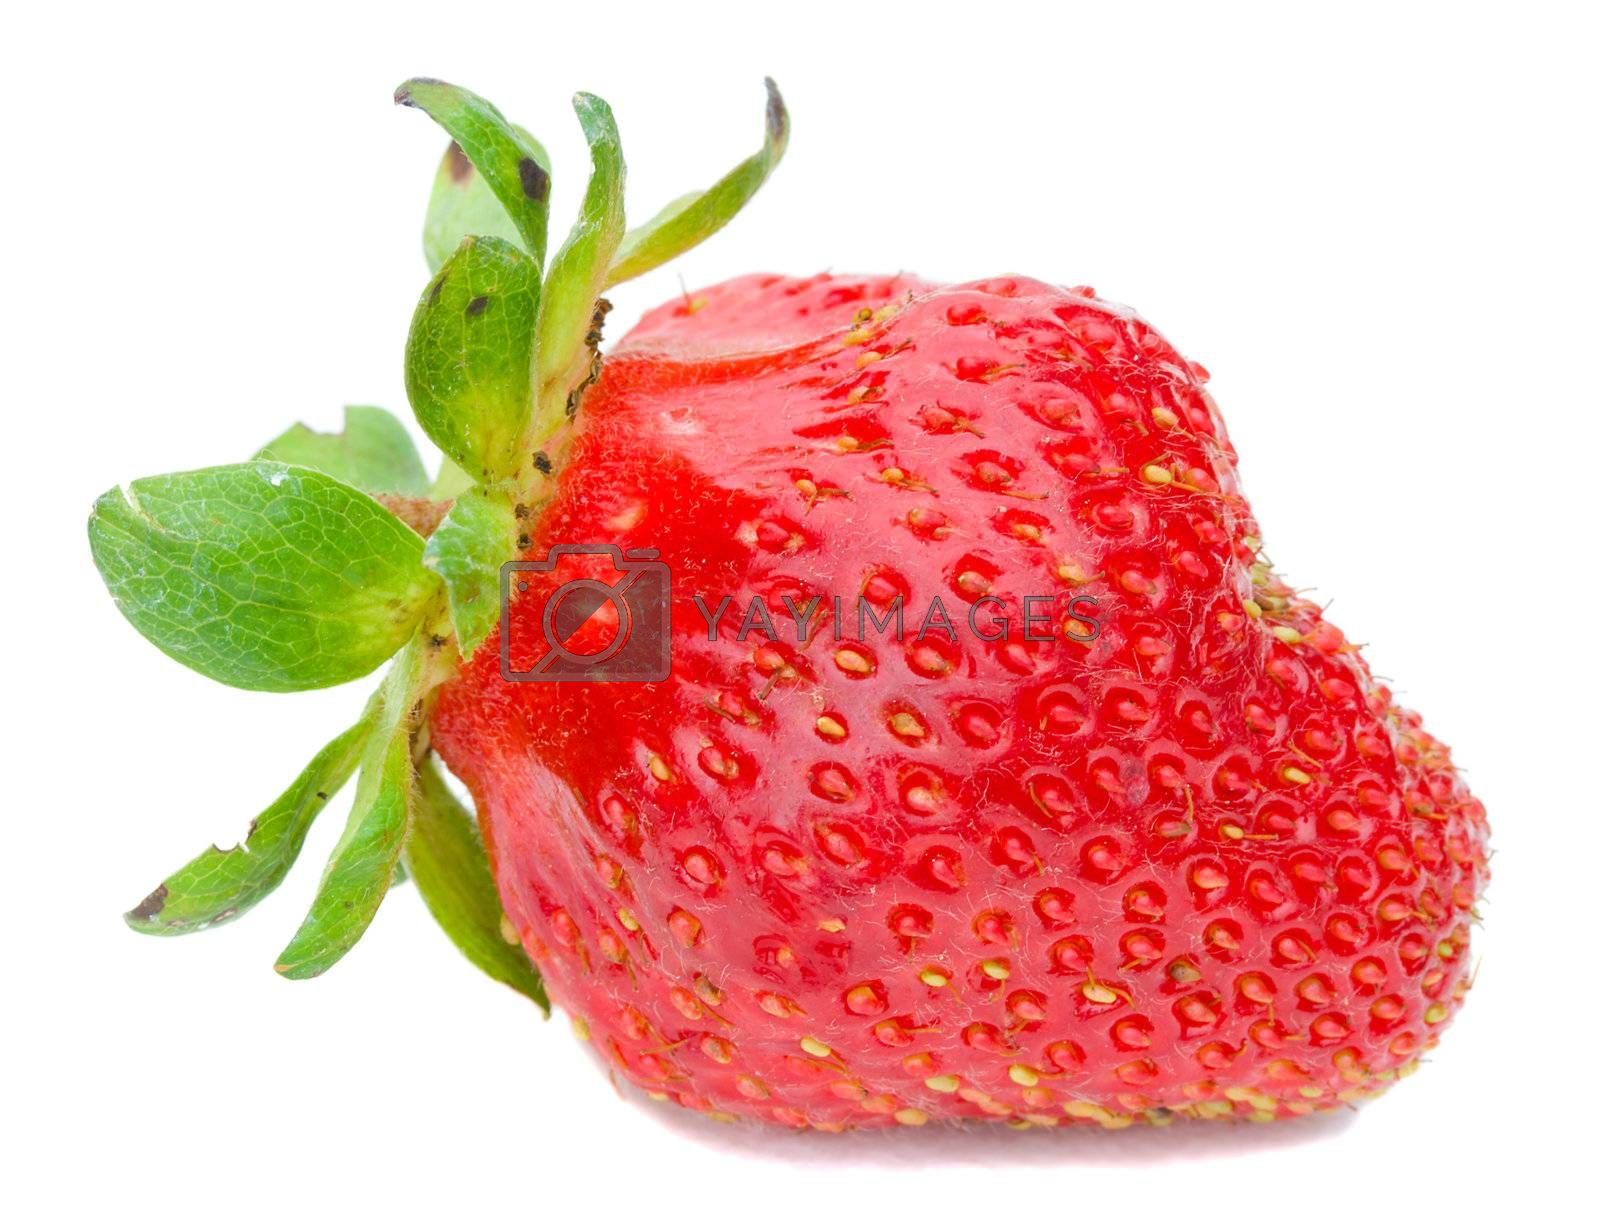 big single strawberry by Alekcey